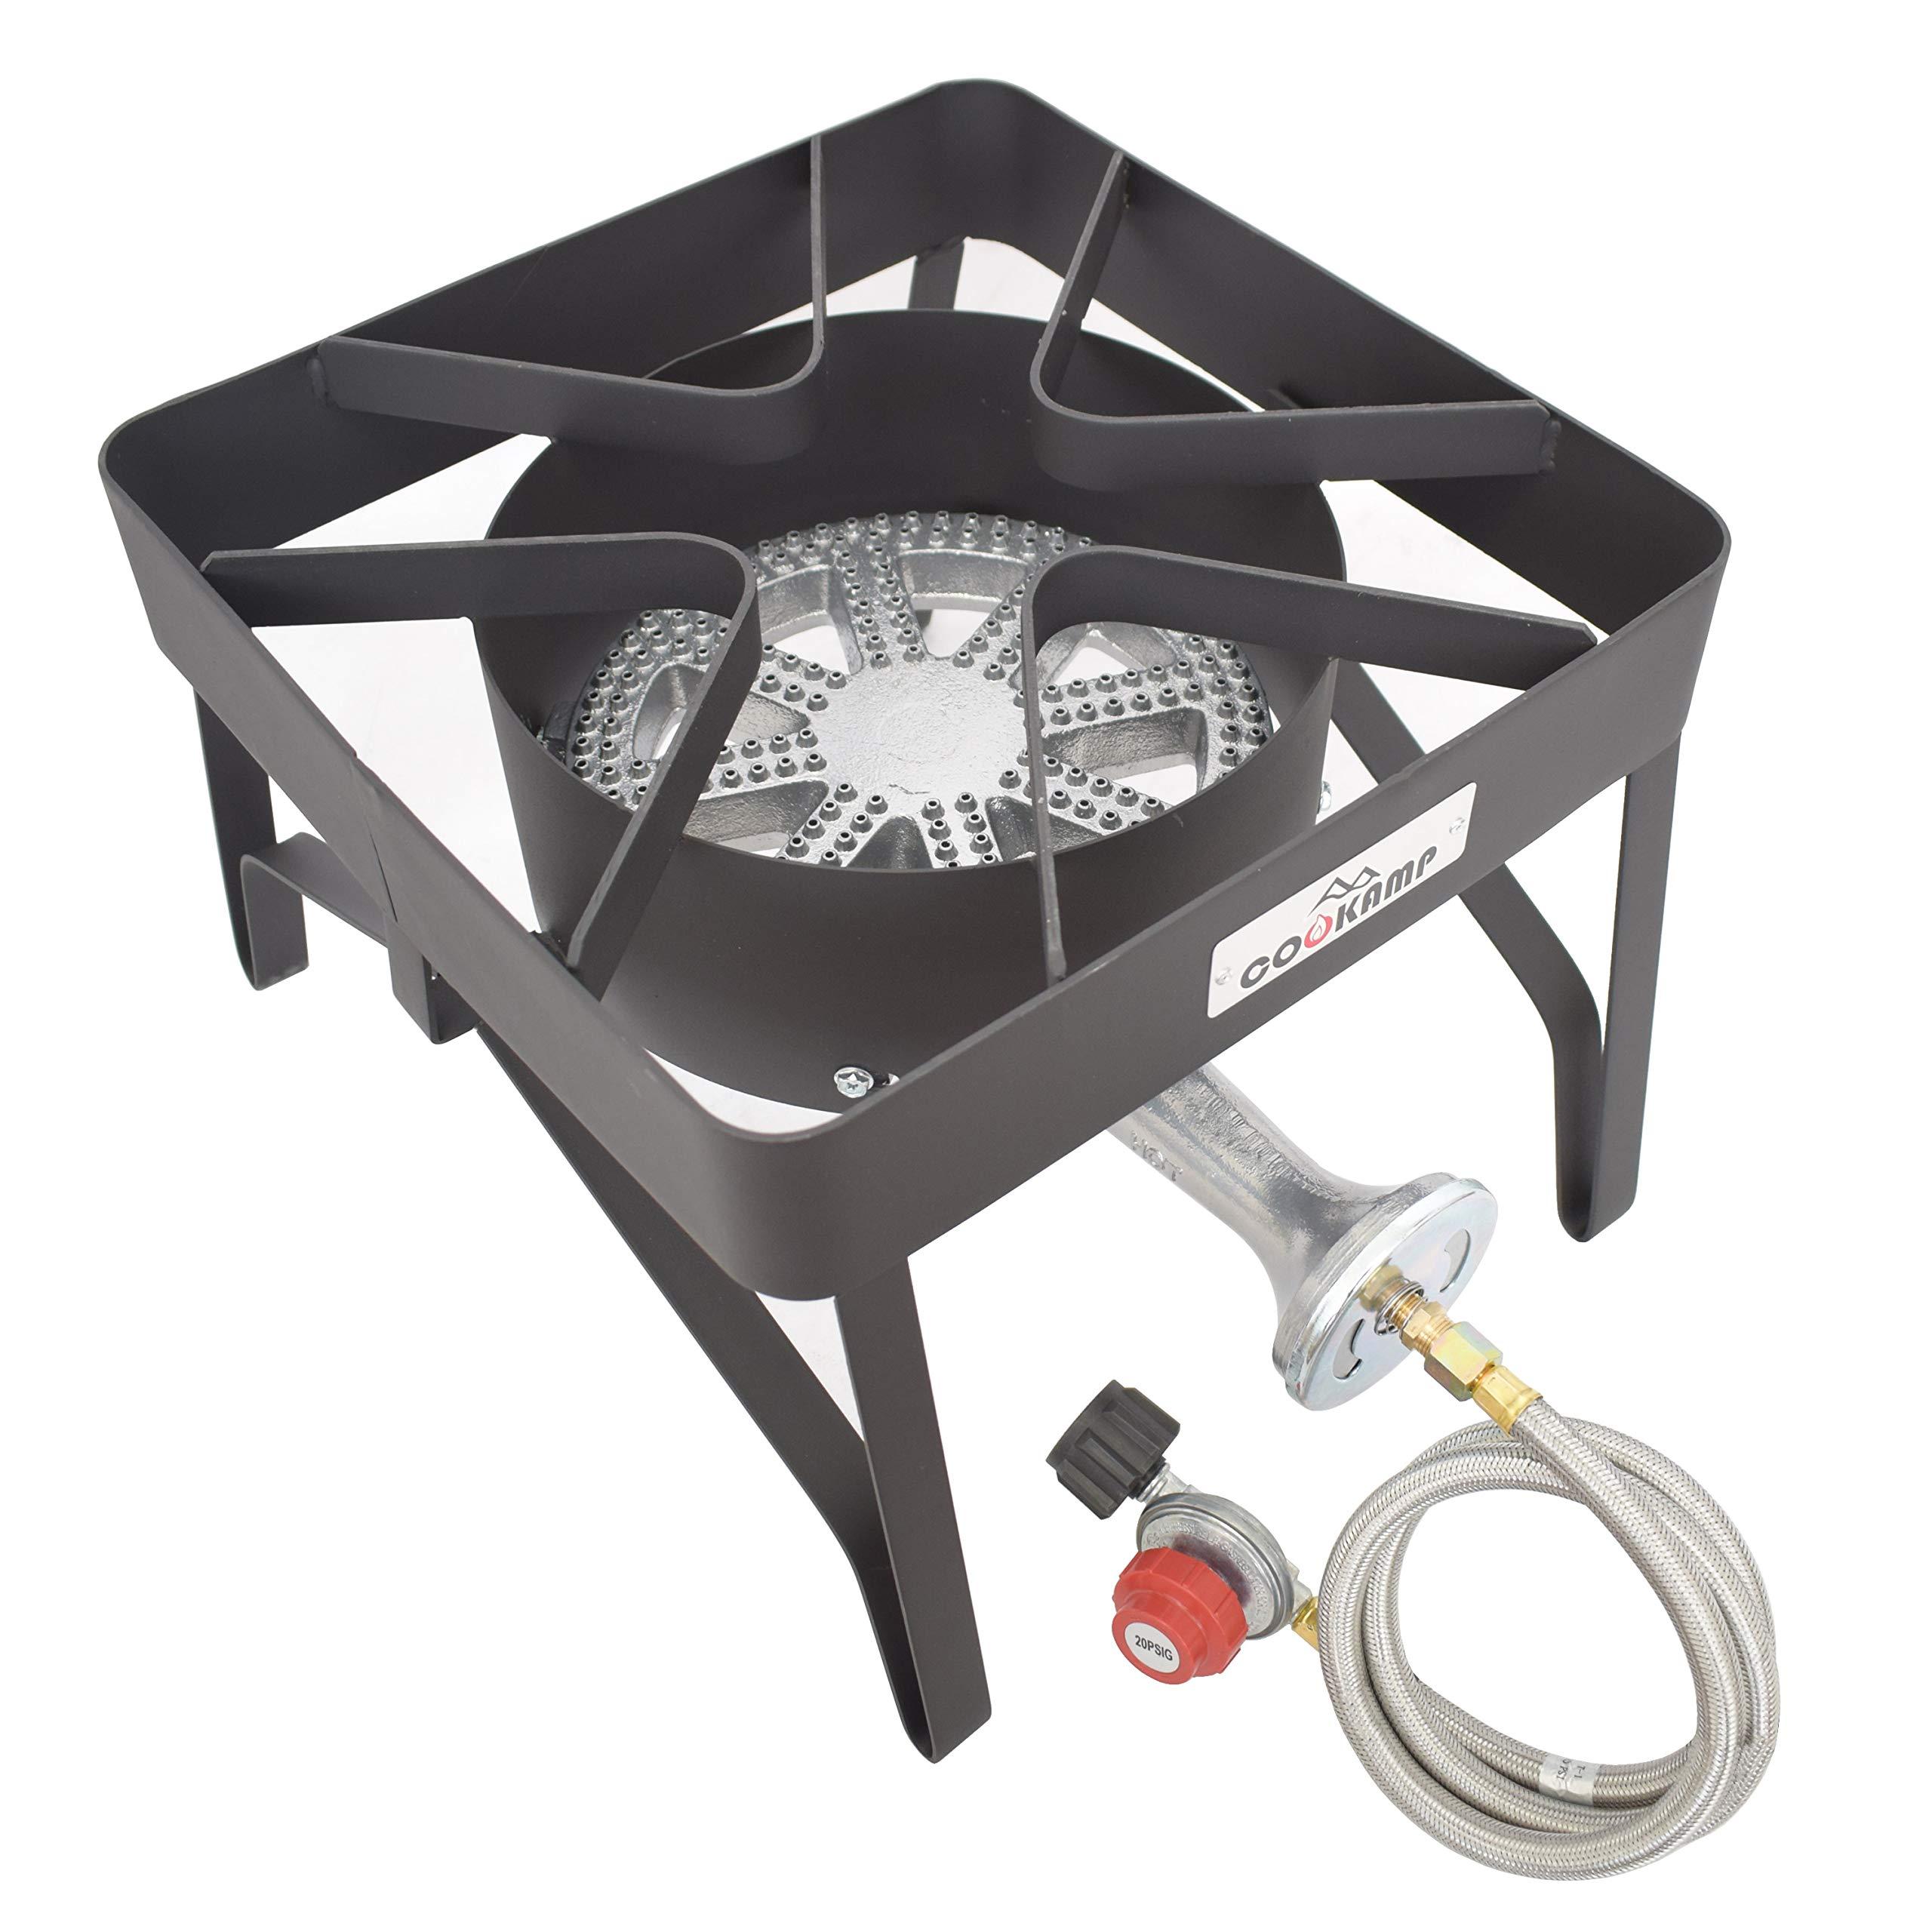 COOKAMP High Pressure Banjo 1-Burner Outdoor Propane Gas Cooker with 0-20 PSI Adjustable Regulator and Steel Braided Hose [ 2018 New Model ] SA1250